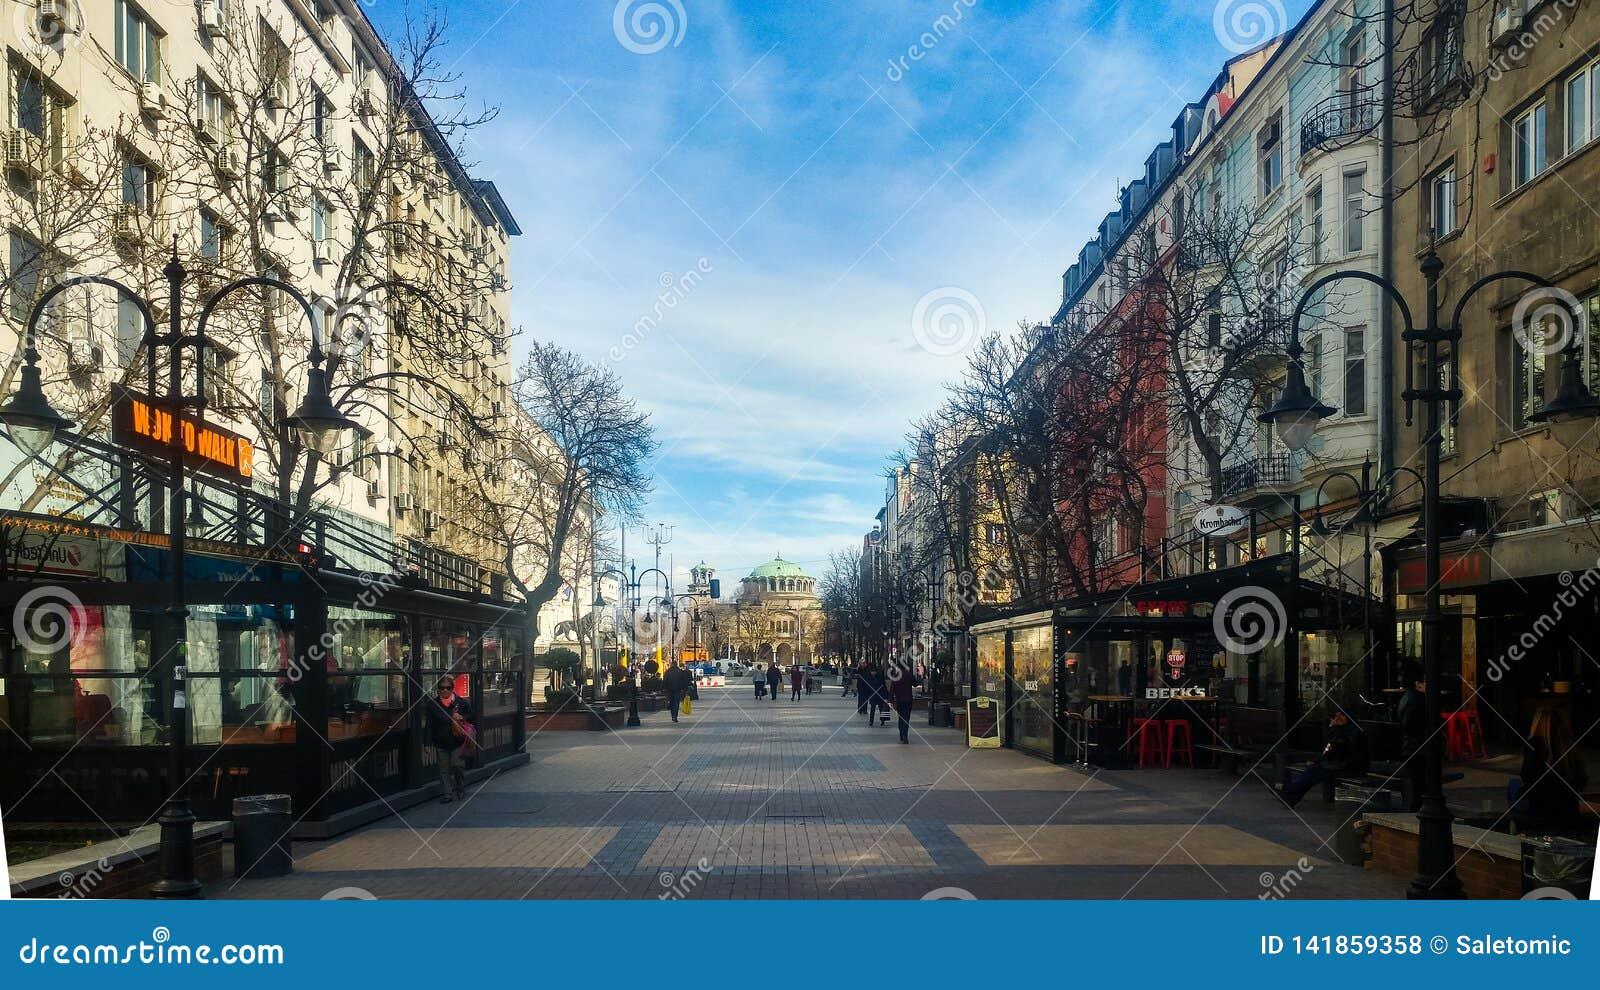 Sofía, Bulgaria - 11 de marzo de 2019: Calle que camina peatonal de Sofía en un día soleado